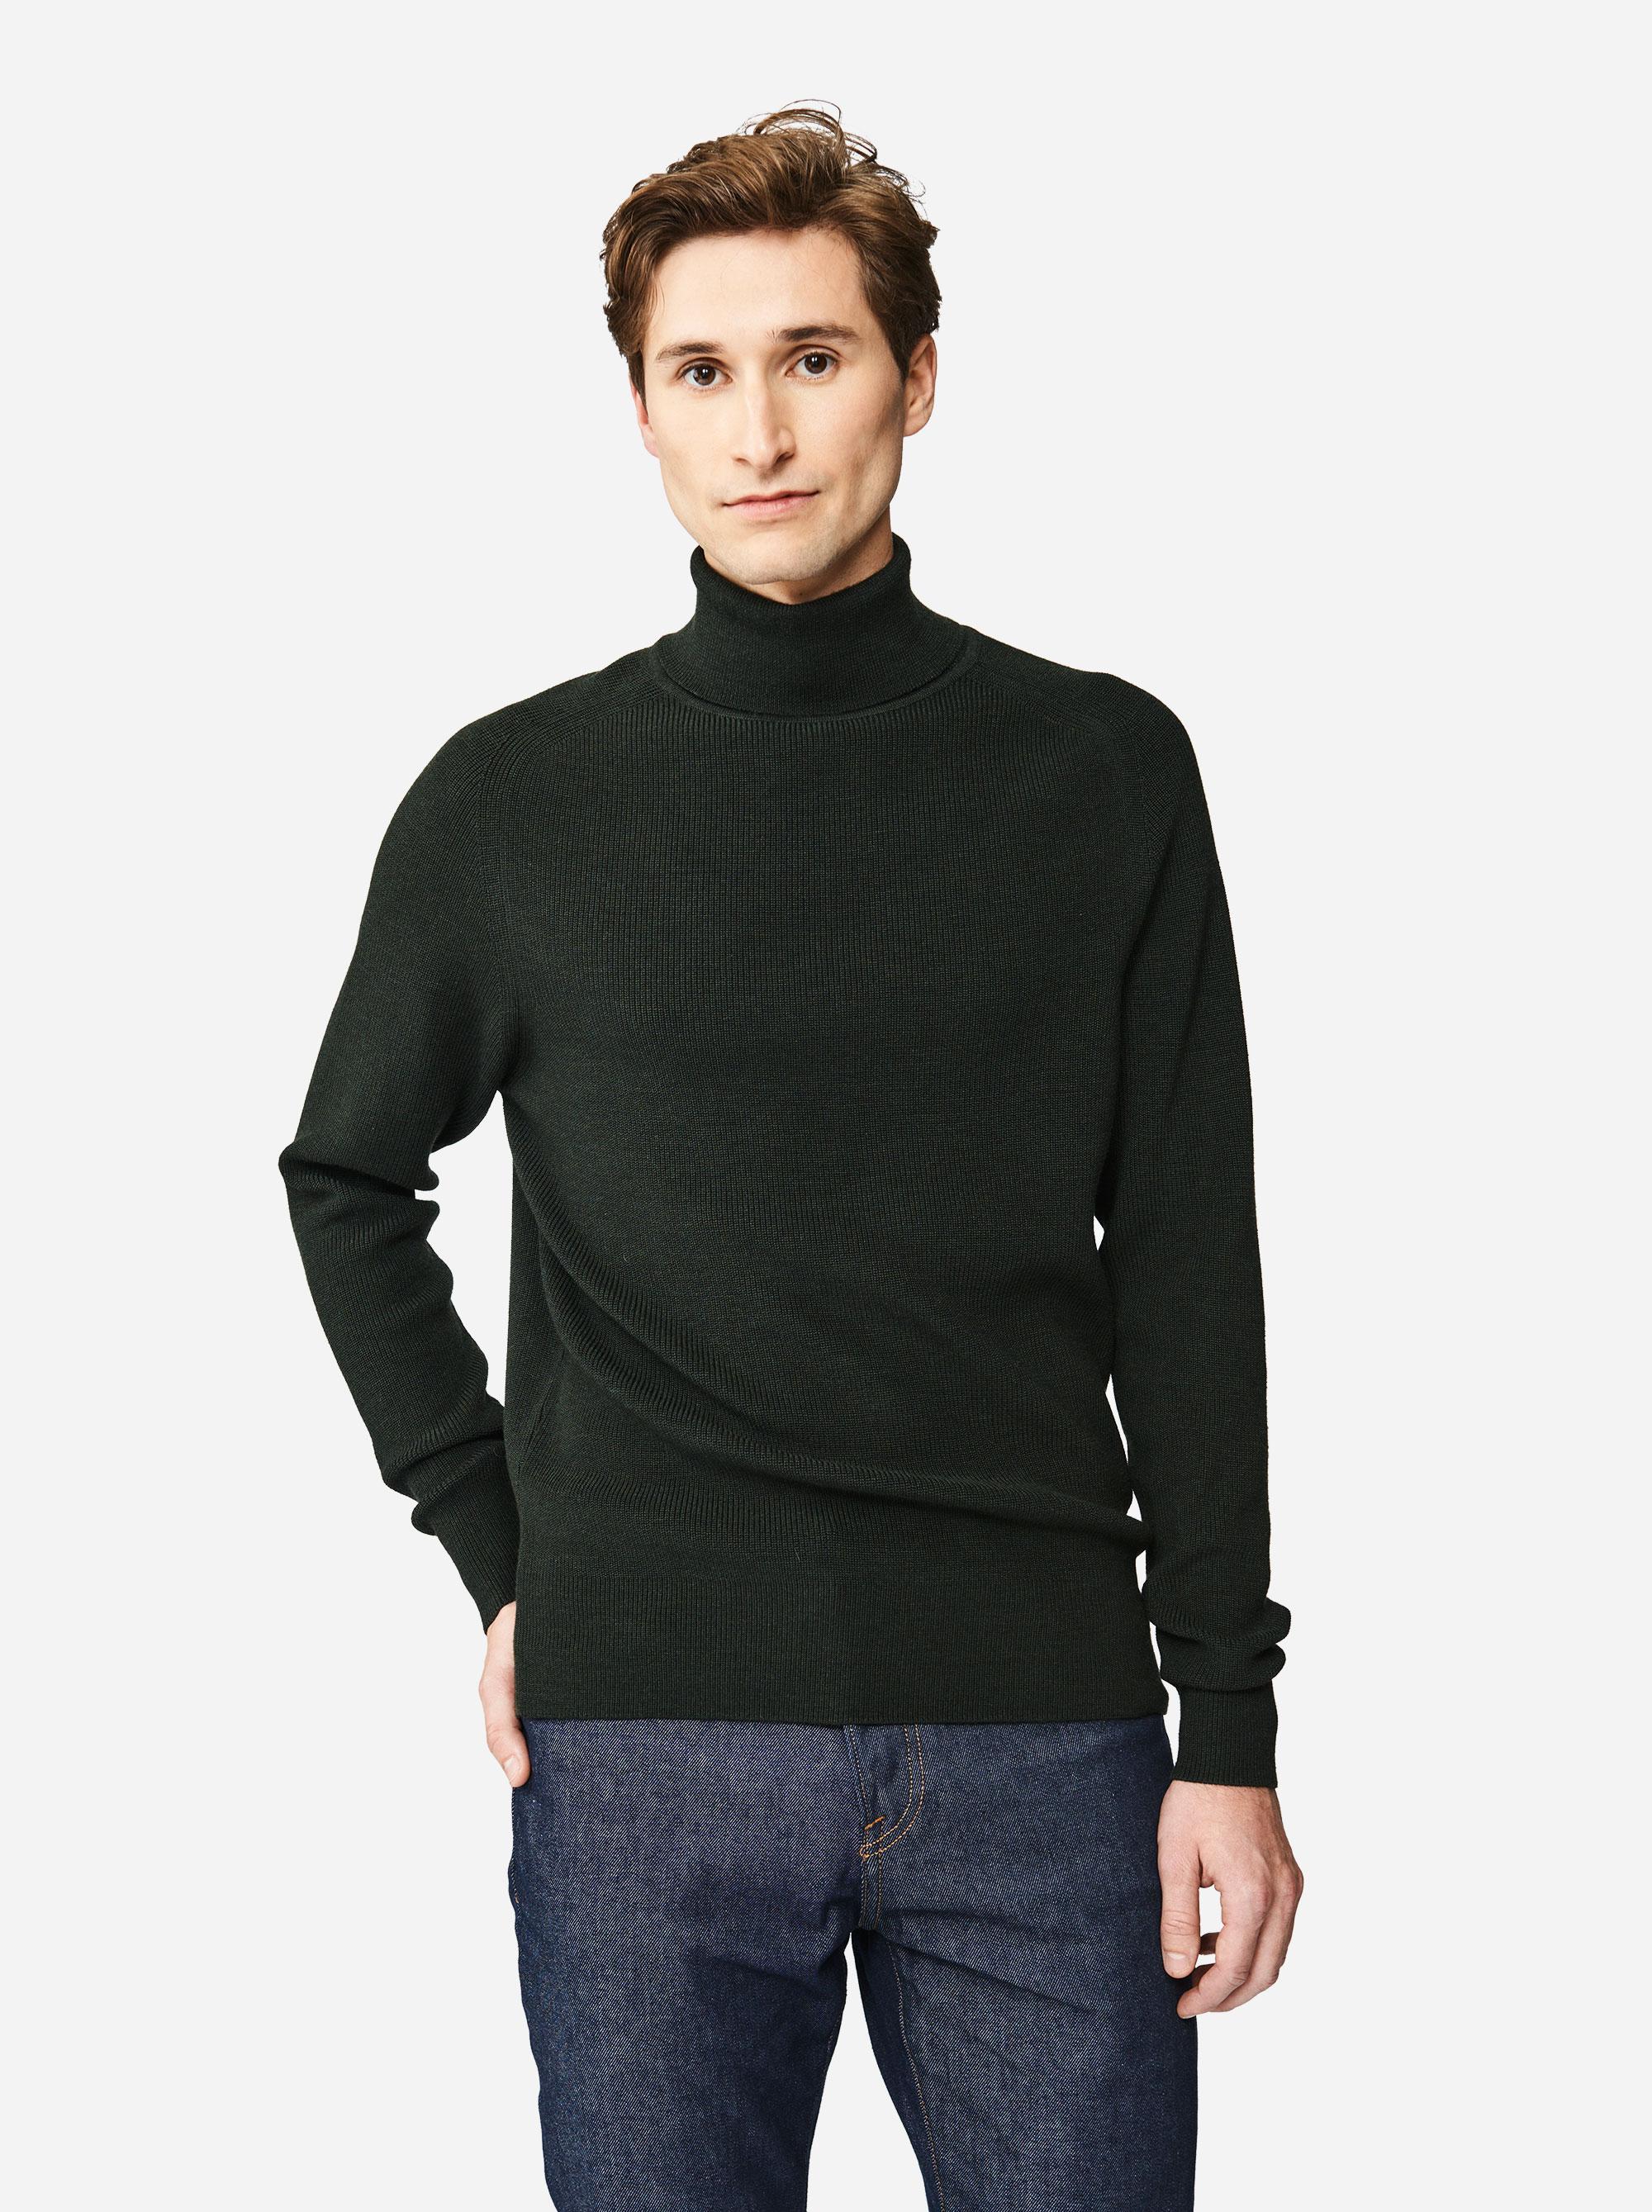 Teym - Turtleneck - The Merino Sweater - Men - Green - 3